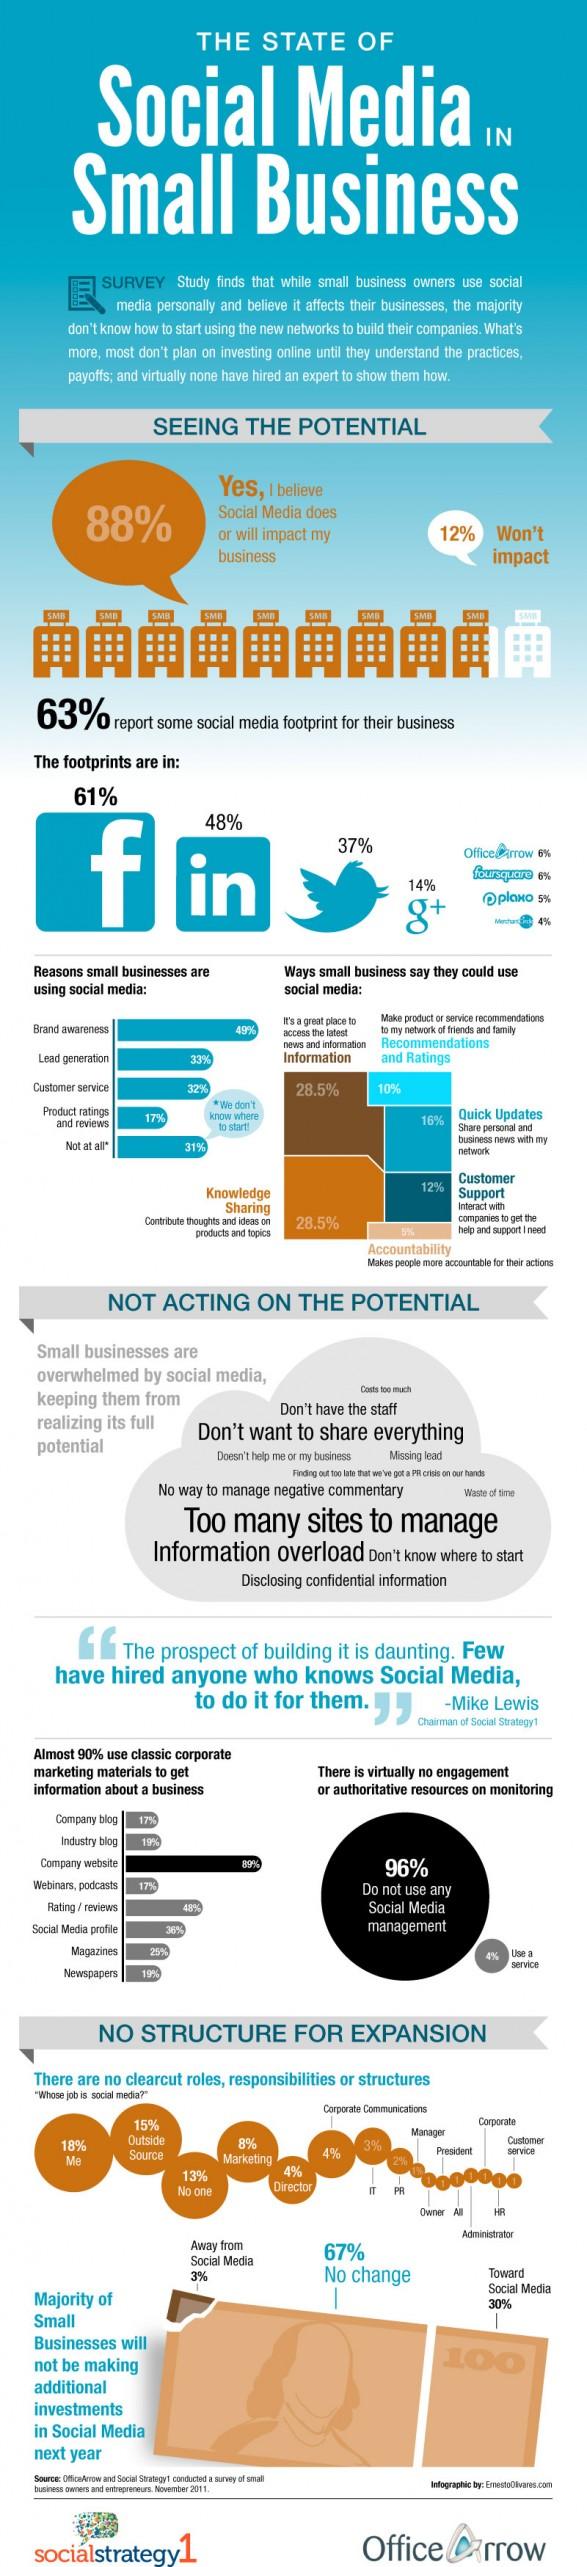 The State of Social Media in Small Business #socialmedia ...